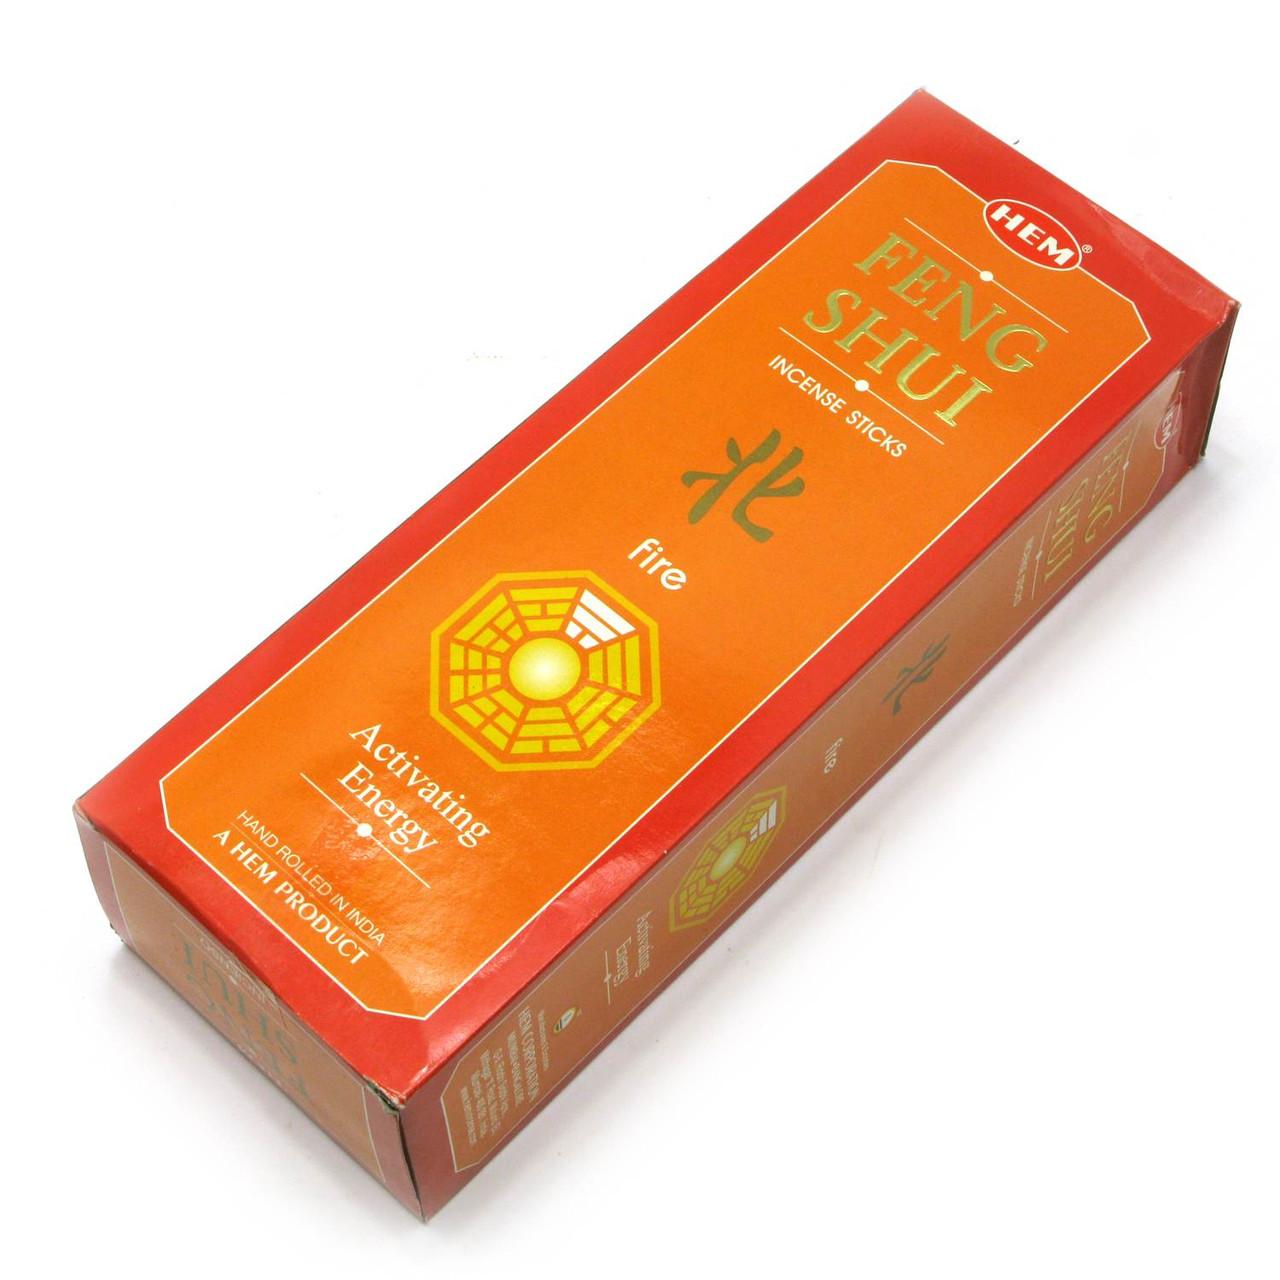 Feng Shui Fire (Hem)(6/уп) шестигранник